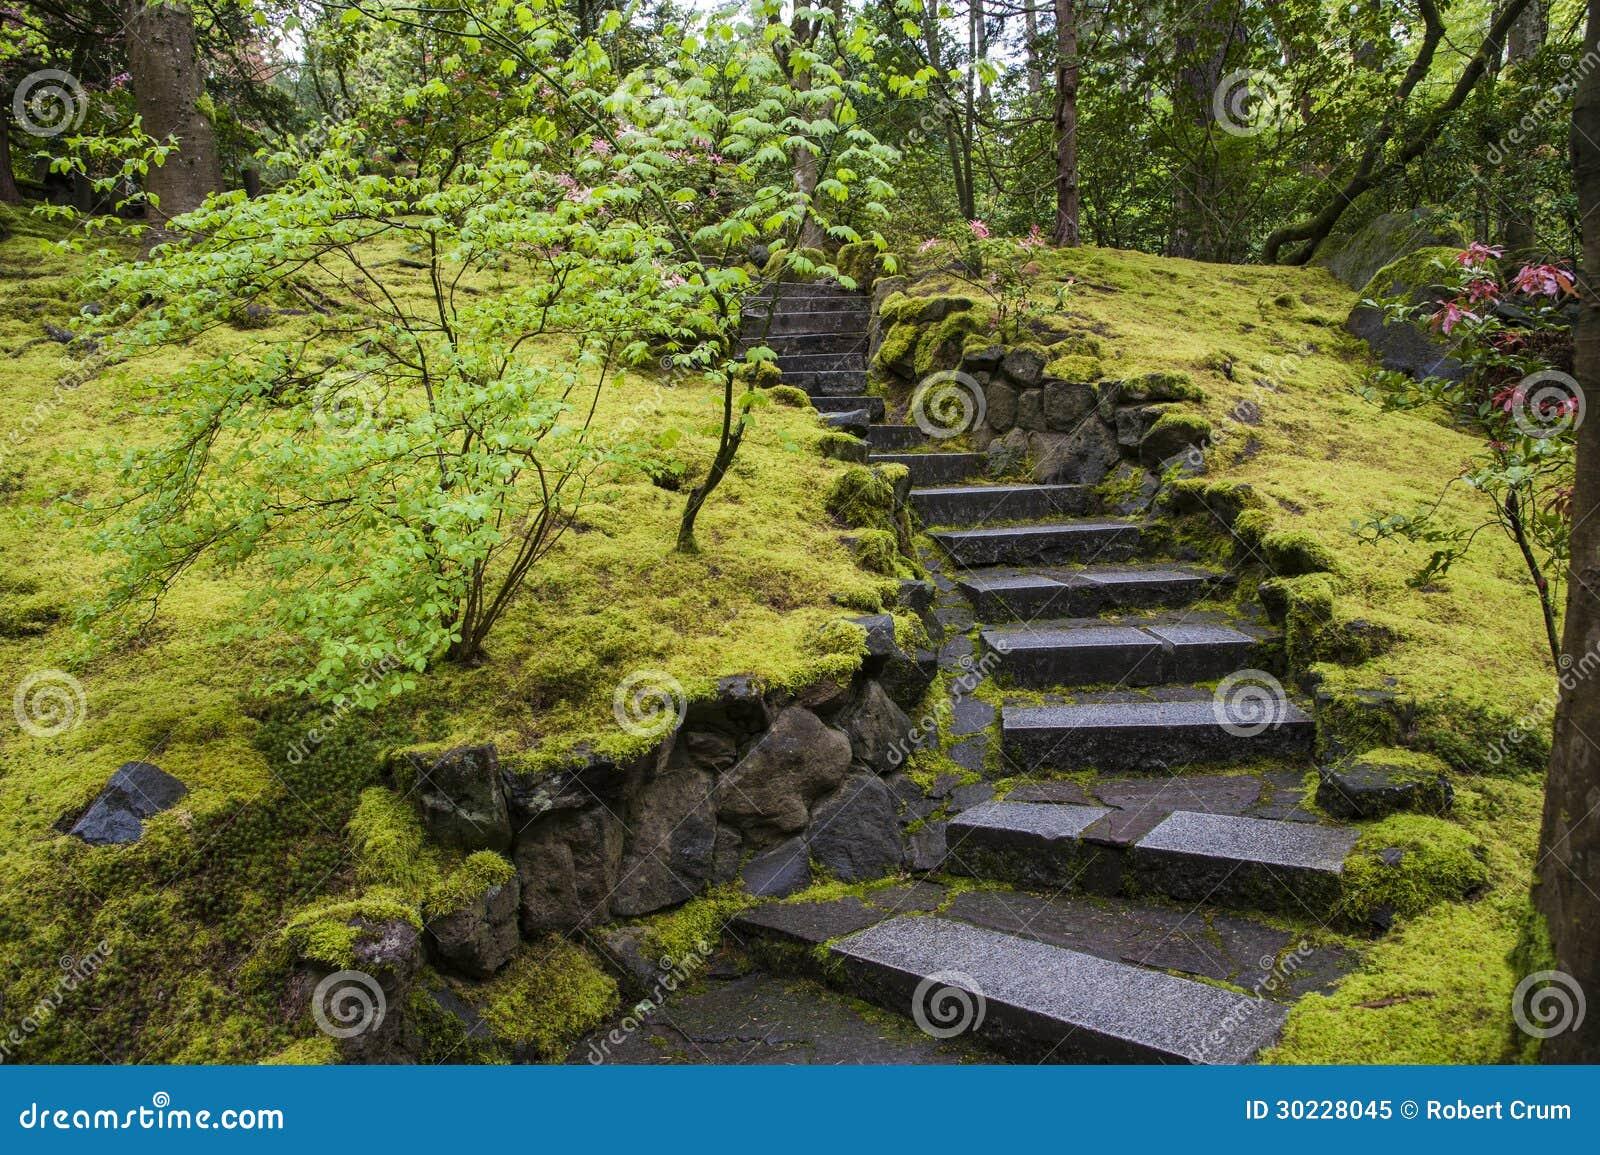 Escalier en pierre dans un jardin photo libre de droits image 30228045 for Escalier dans un jardin